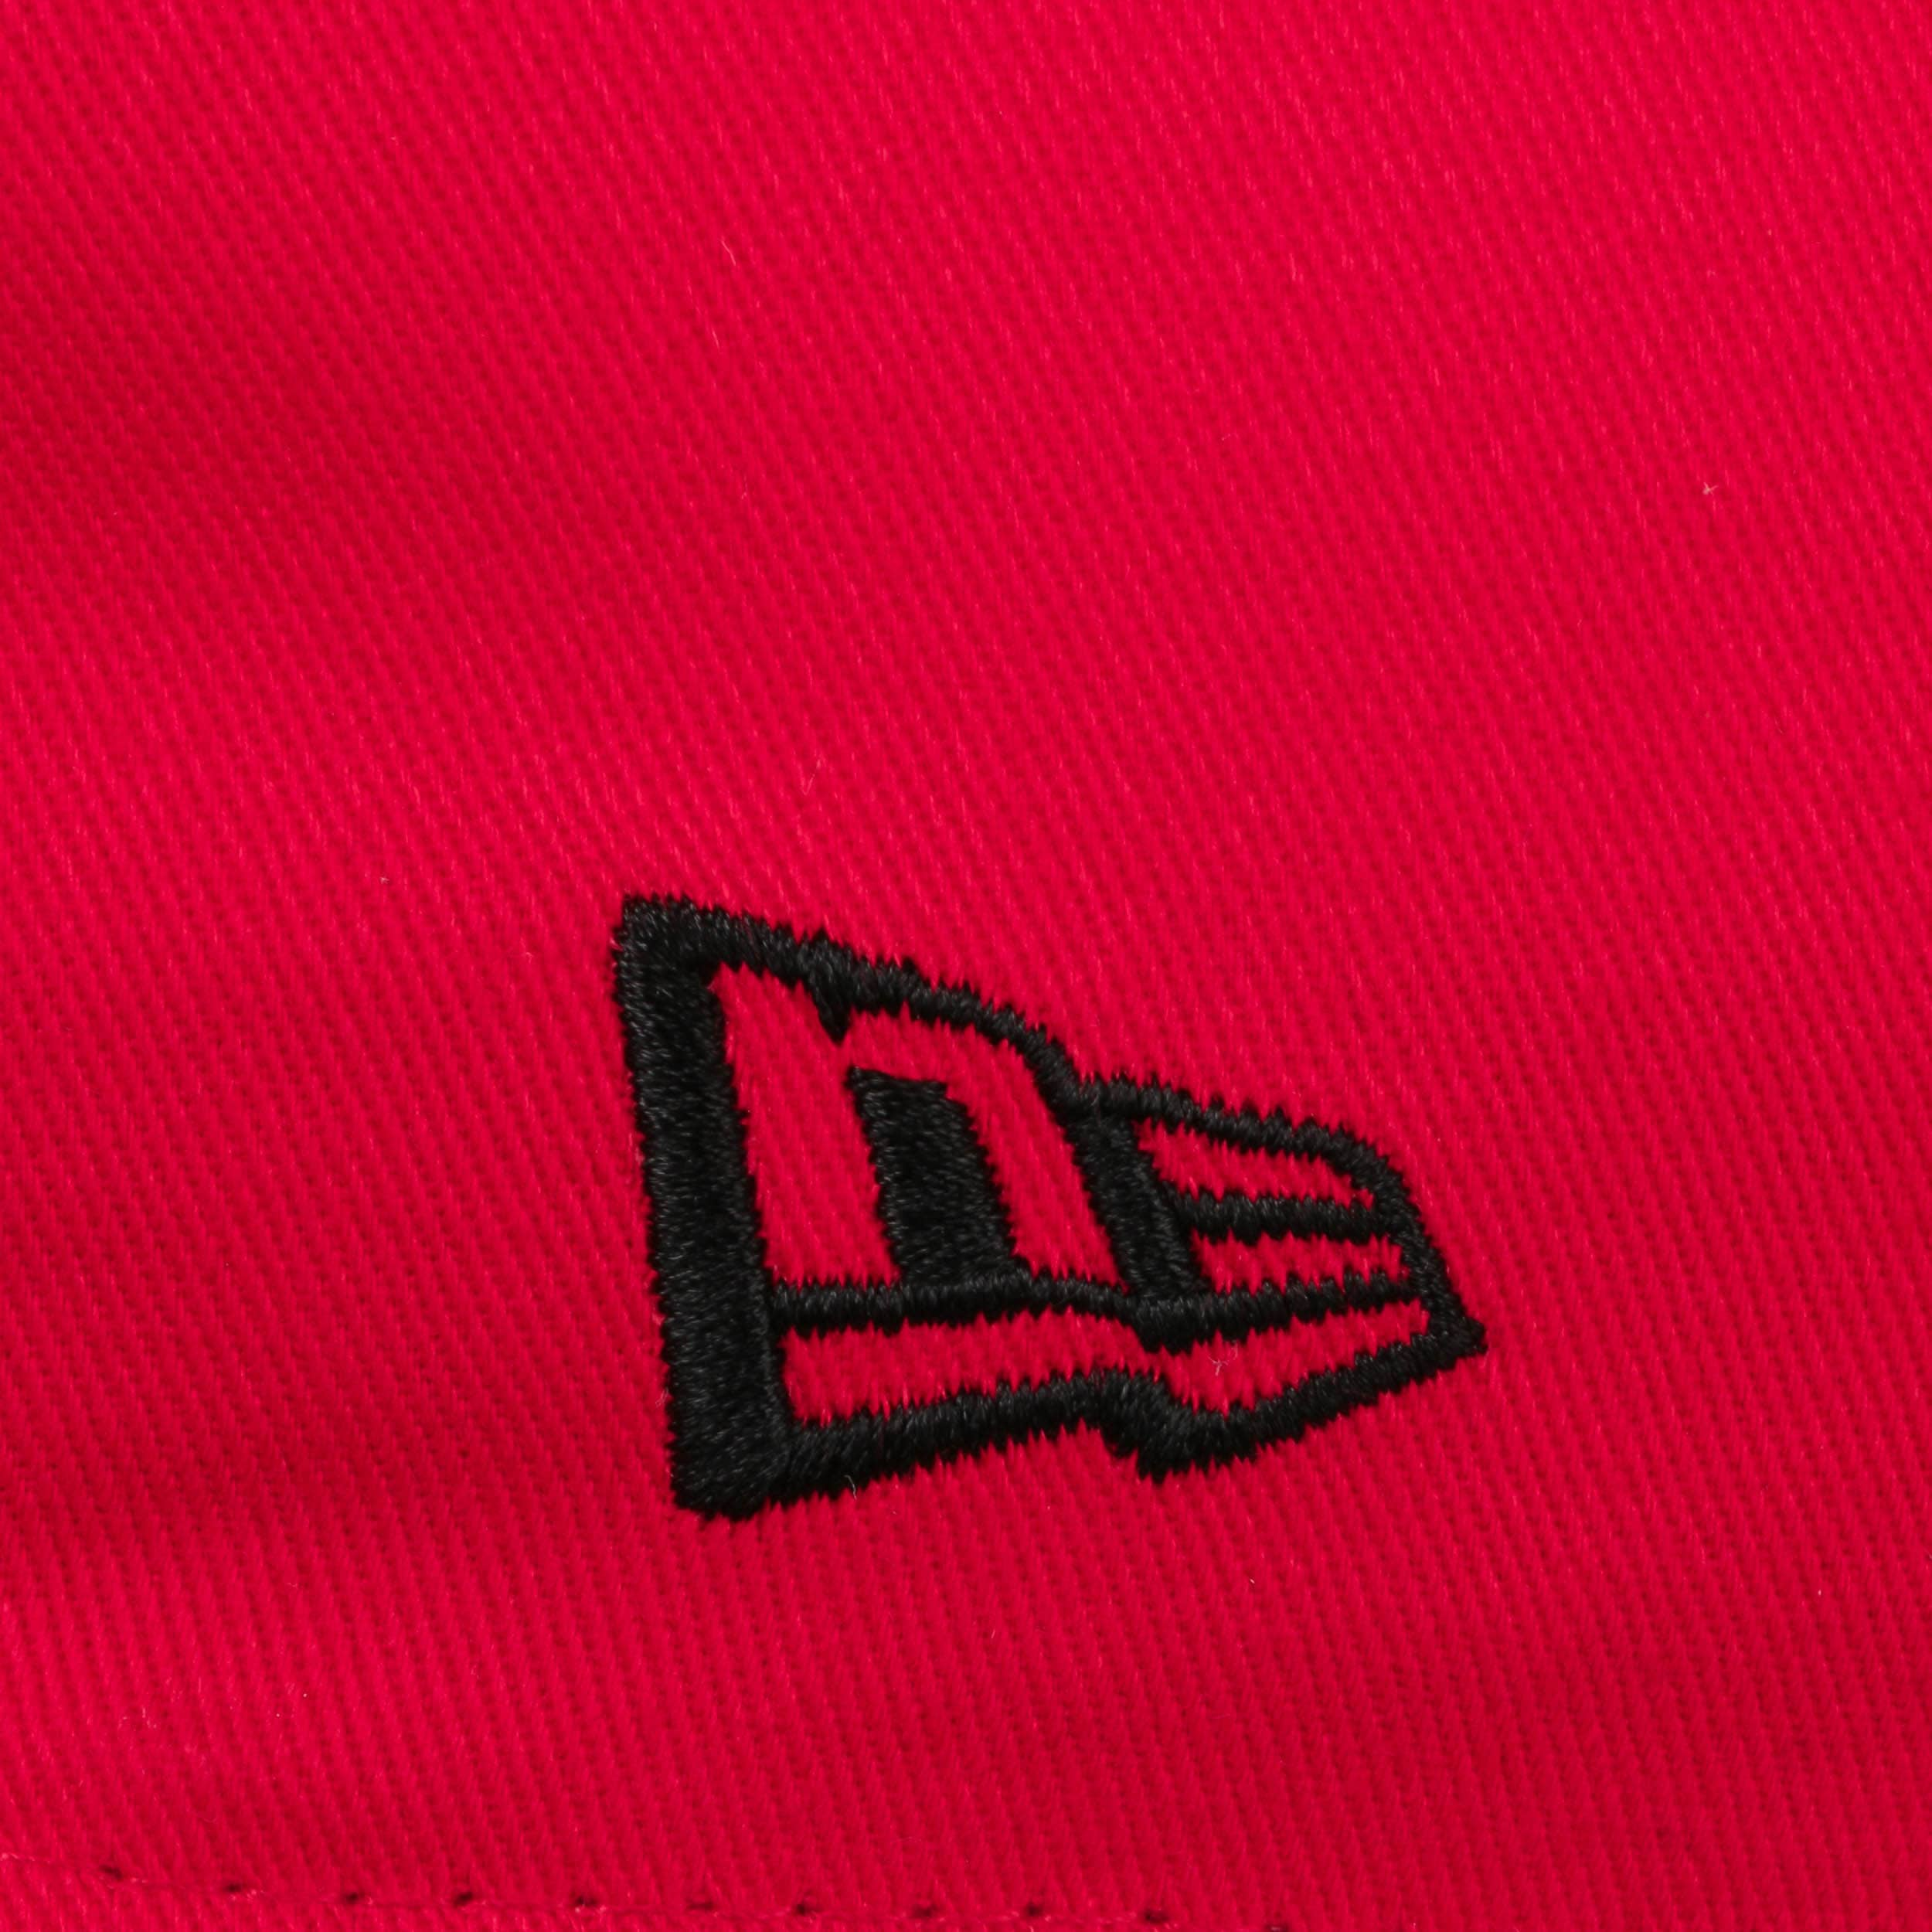 Gorra 9Fifty Junior Bulls Snapback by New Era - Gorras - sombreroshop.es 07840857bcf